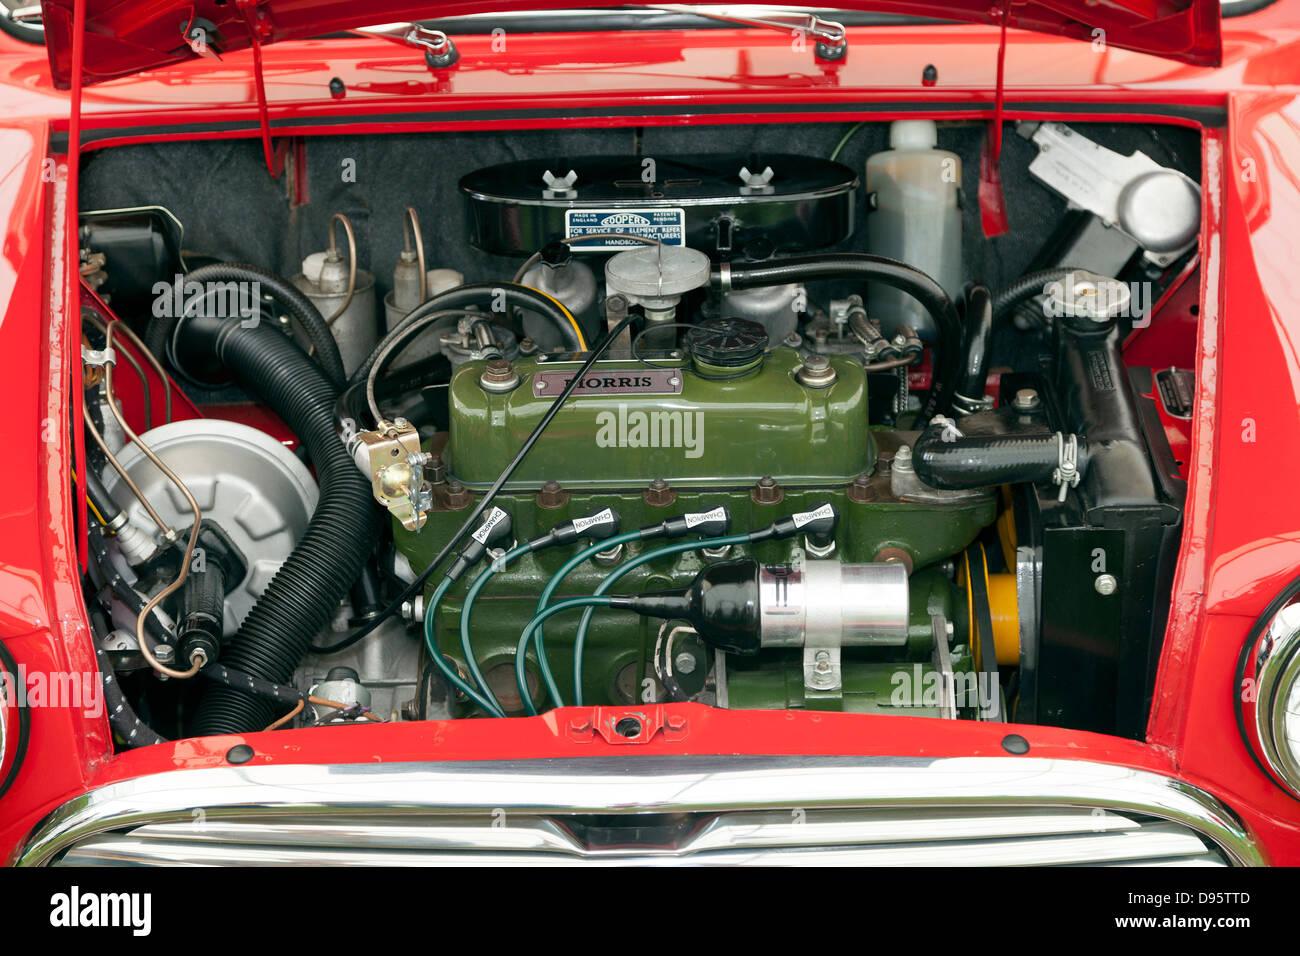 Red Austin Morris Mini Car Engine under bonnet - Stock Image